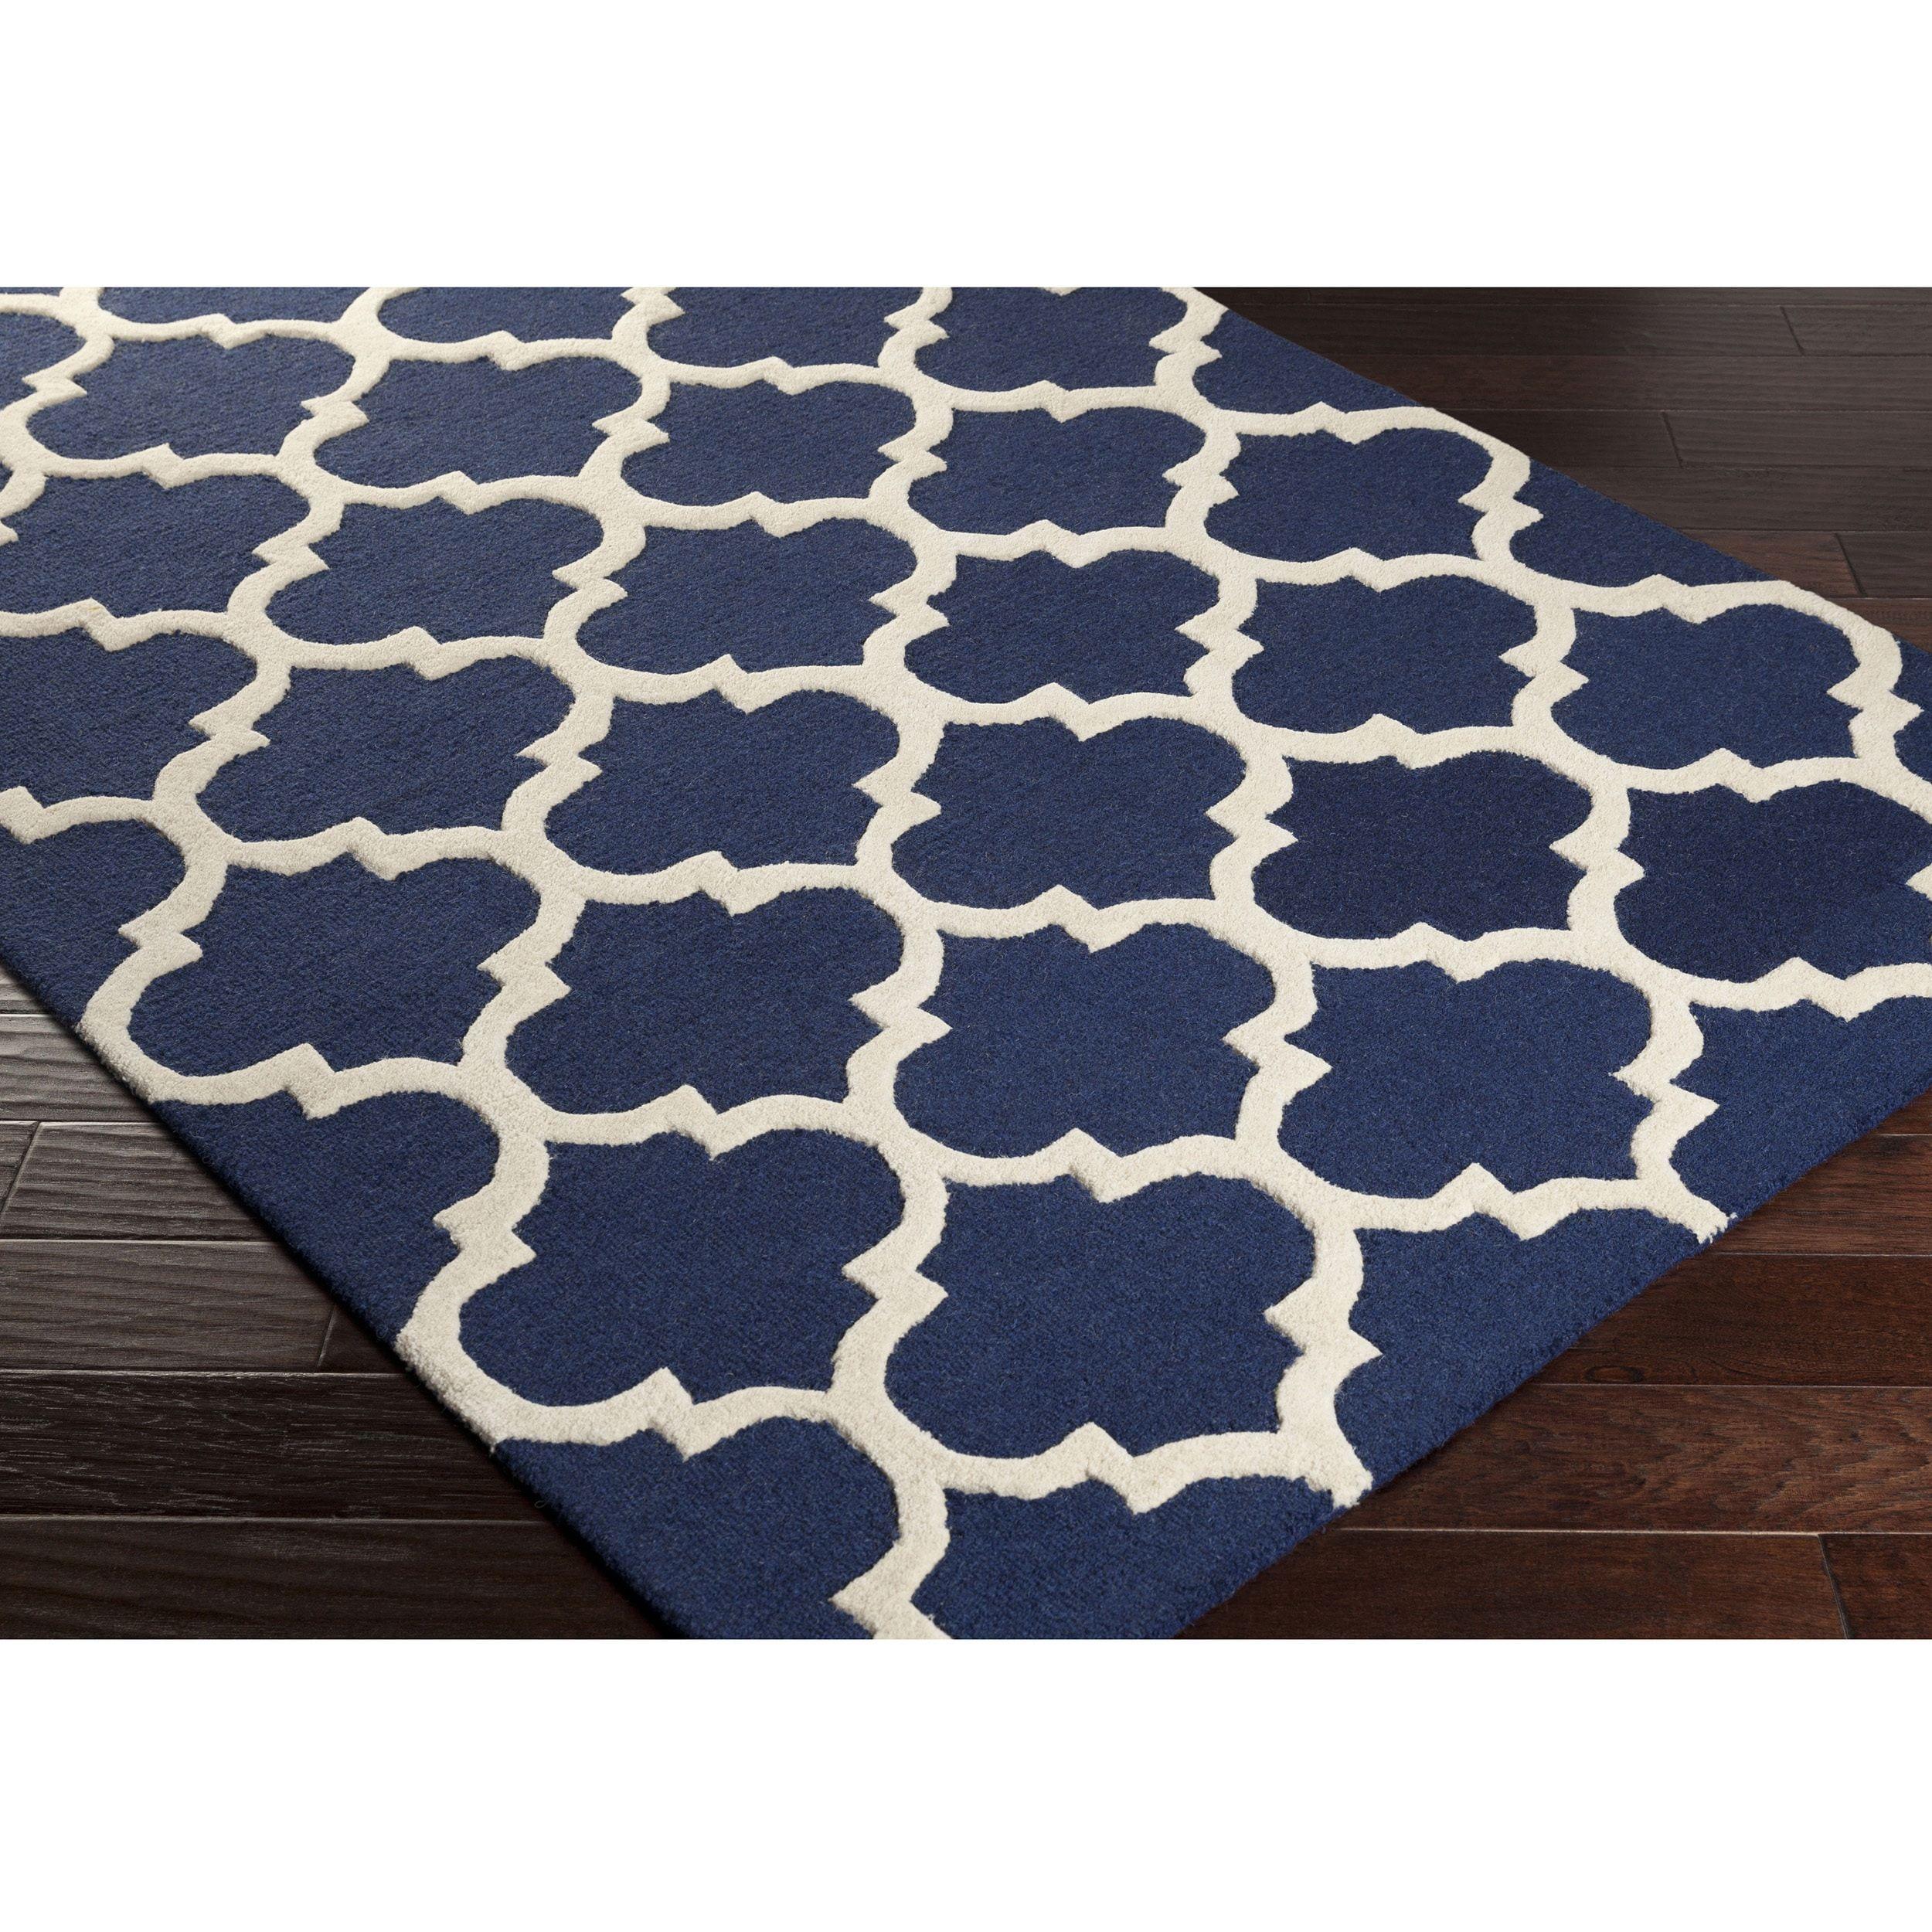 Hand Tufted Till Moroccan Trellis Wool Rug 2 X 3 Navy Blue